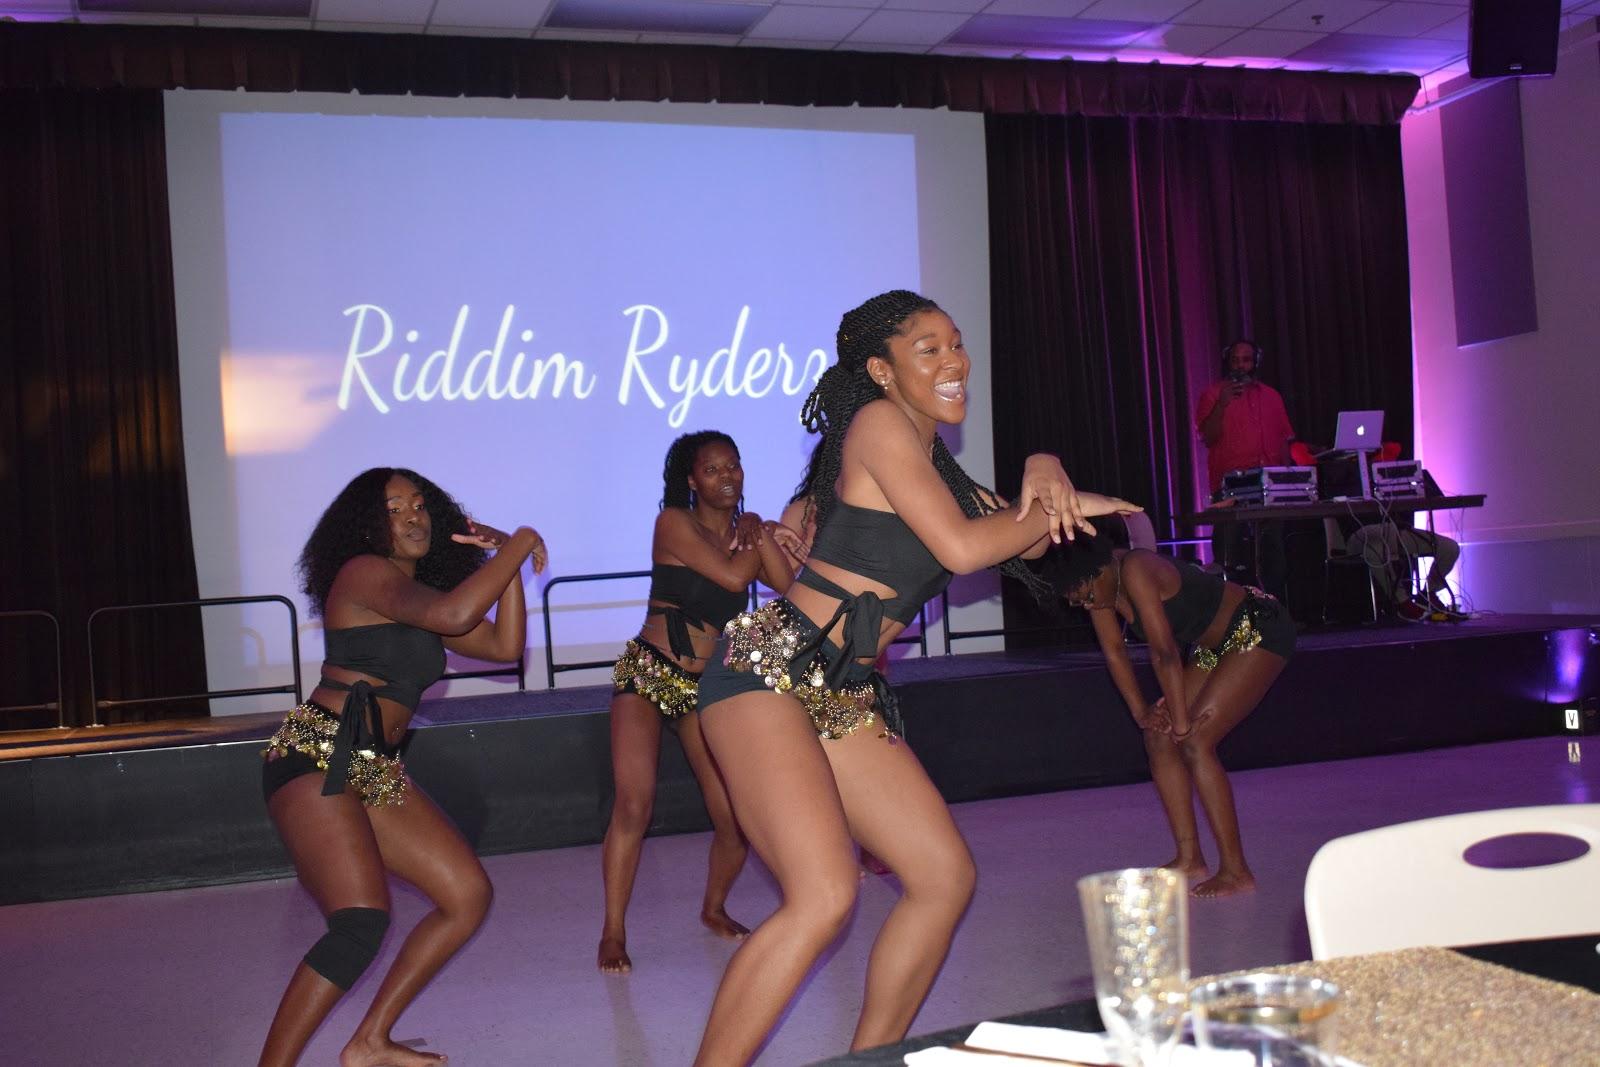 Riddim Ryderz putting on a performance in the Nyumburu Cultural Center. (Sydney Bullock/The Black Explosion)